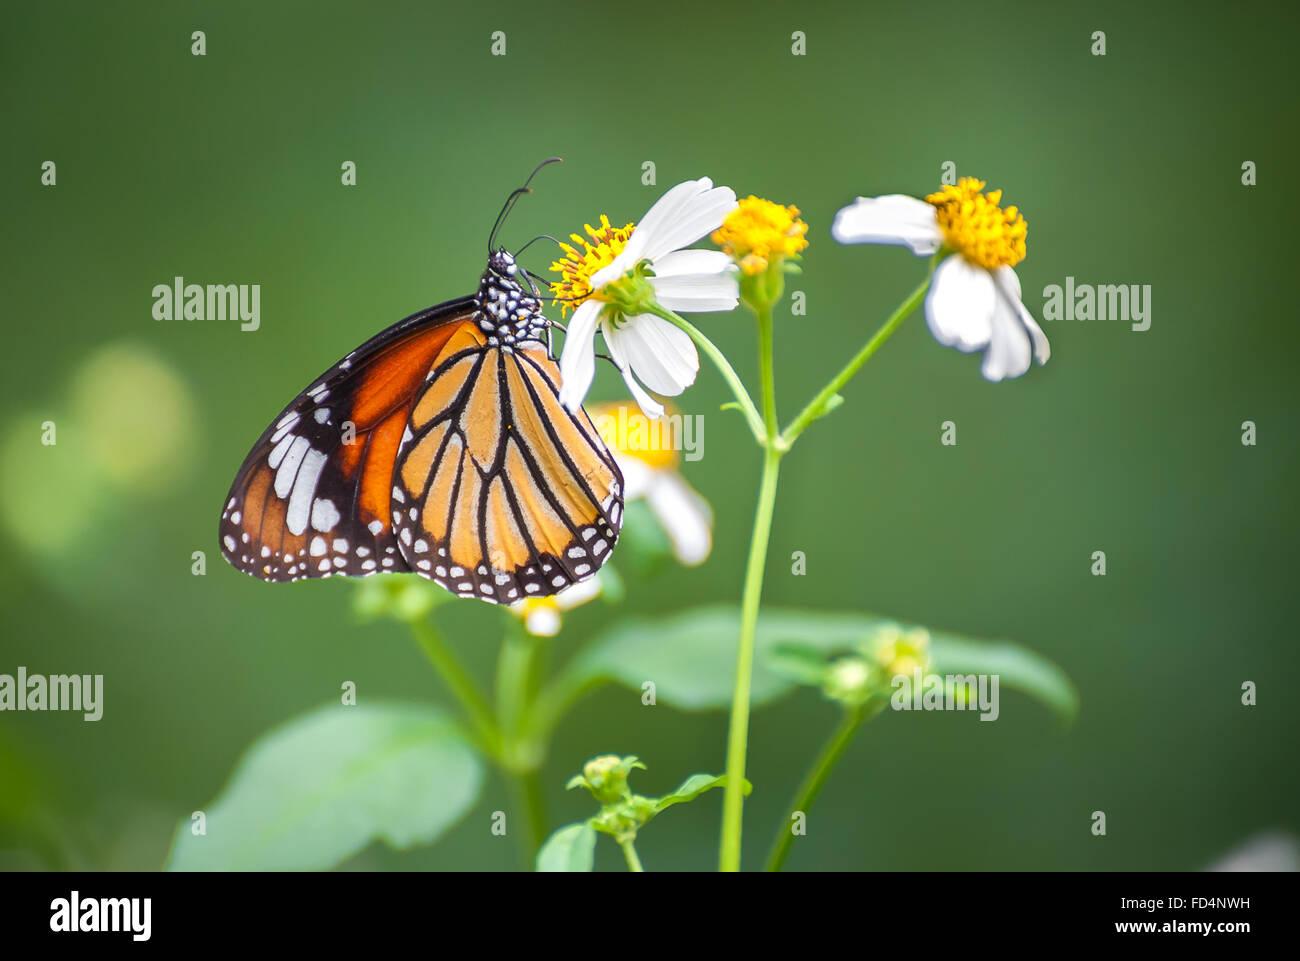 Closeup of the Common Tiger butterfly (Danaus genutia) feeding on a garden flower - Stock Image